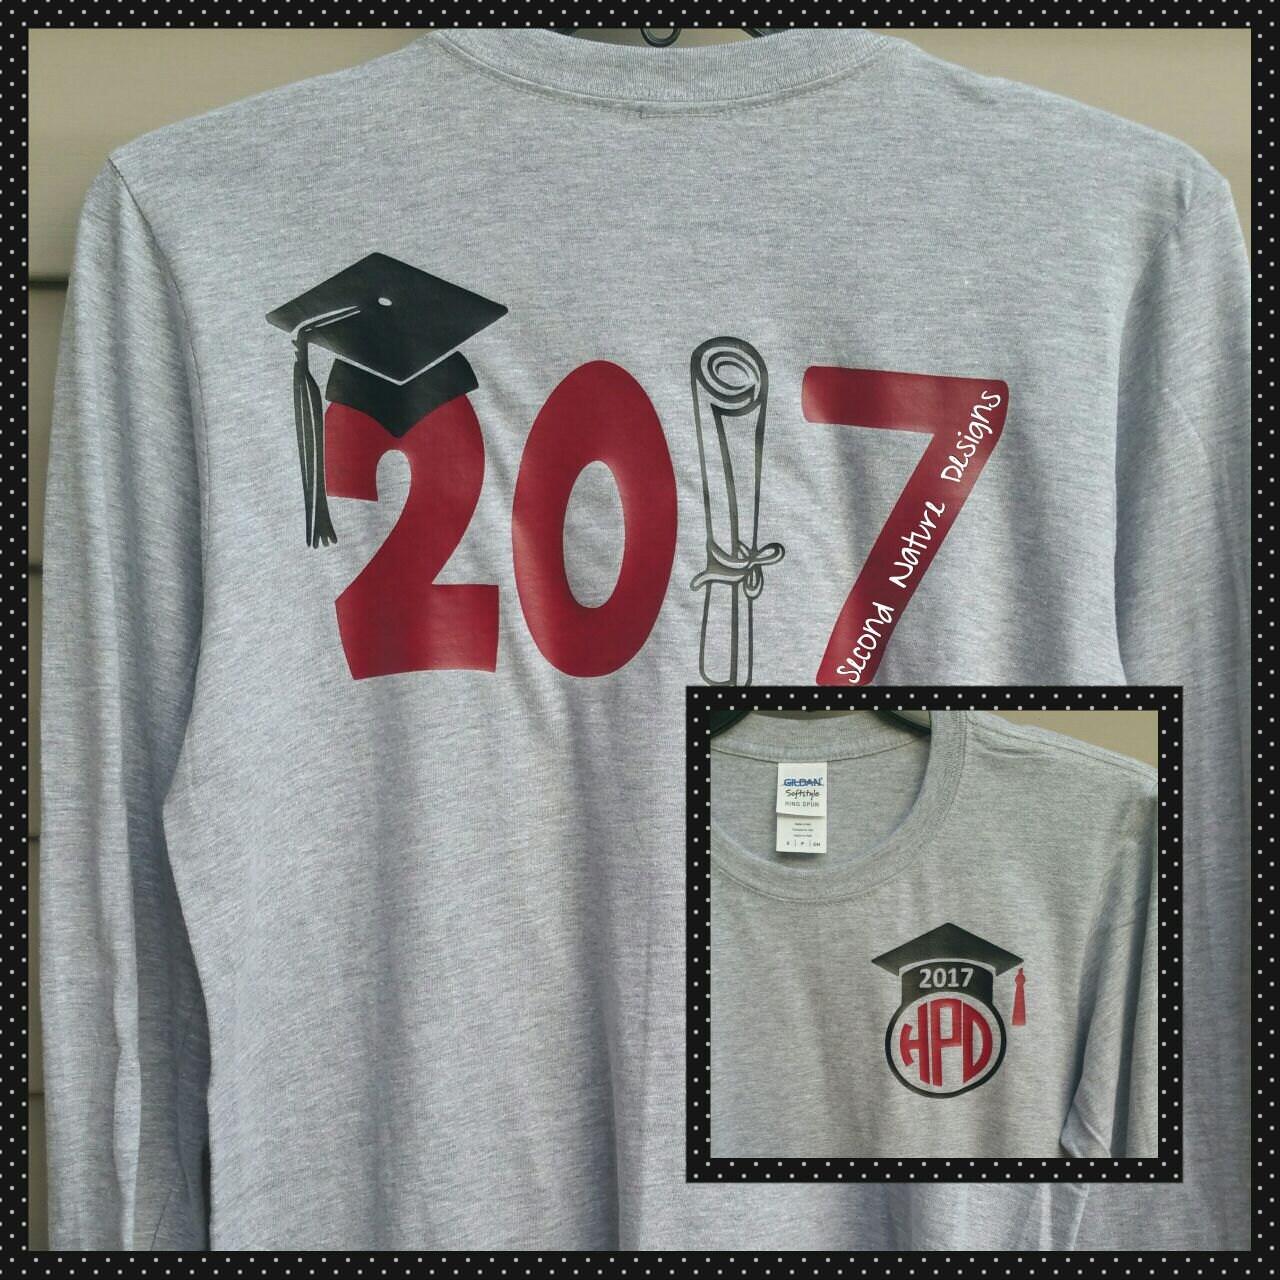 2017 High School Or College Graduate T Shirt Monogram